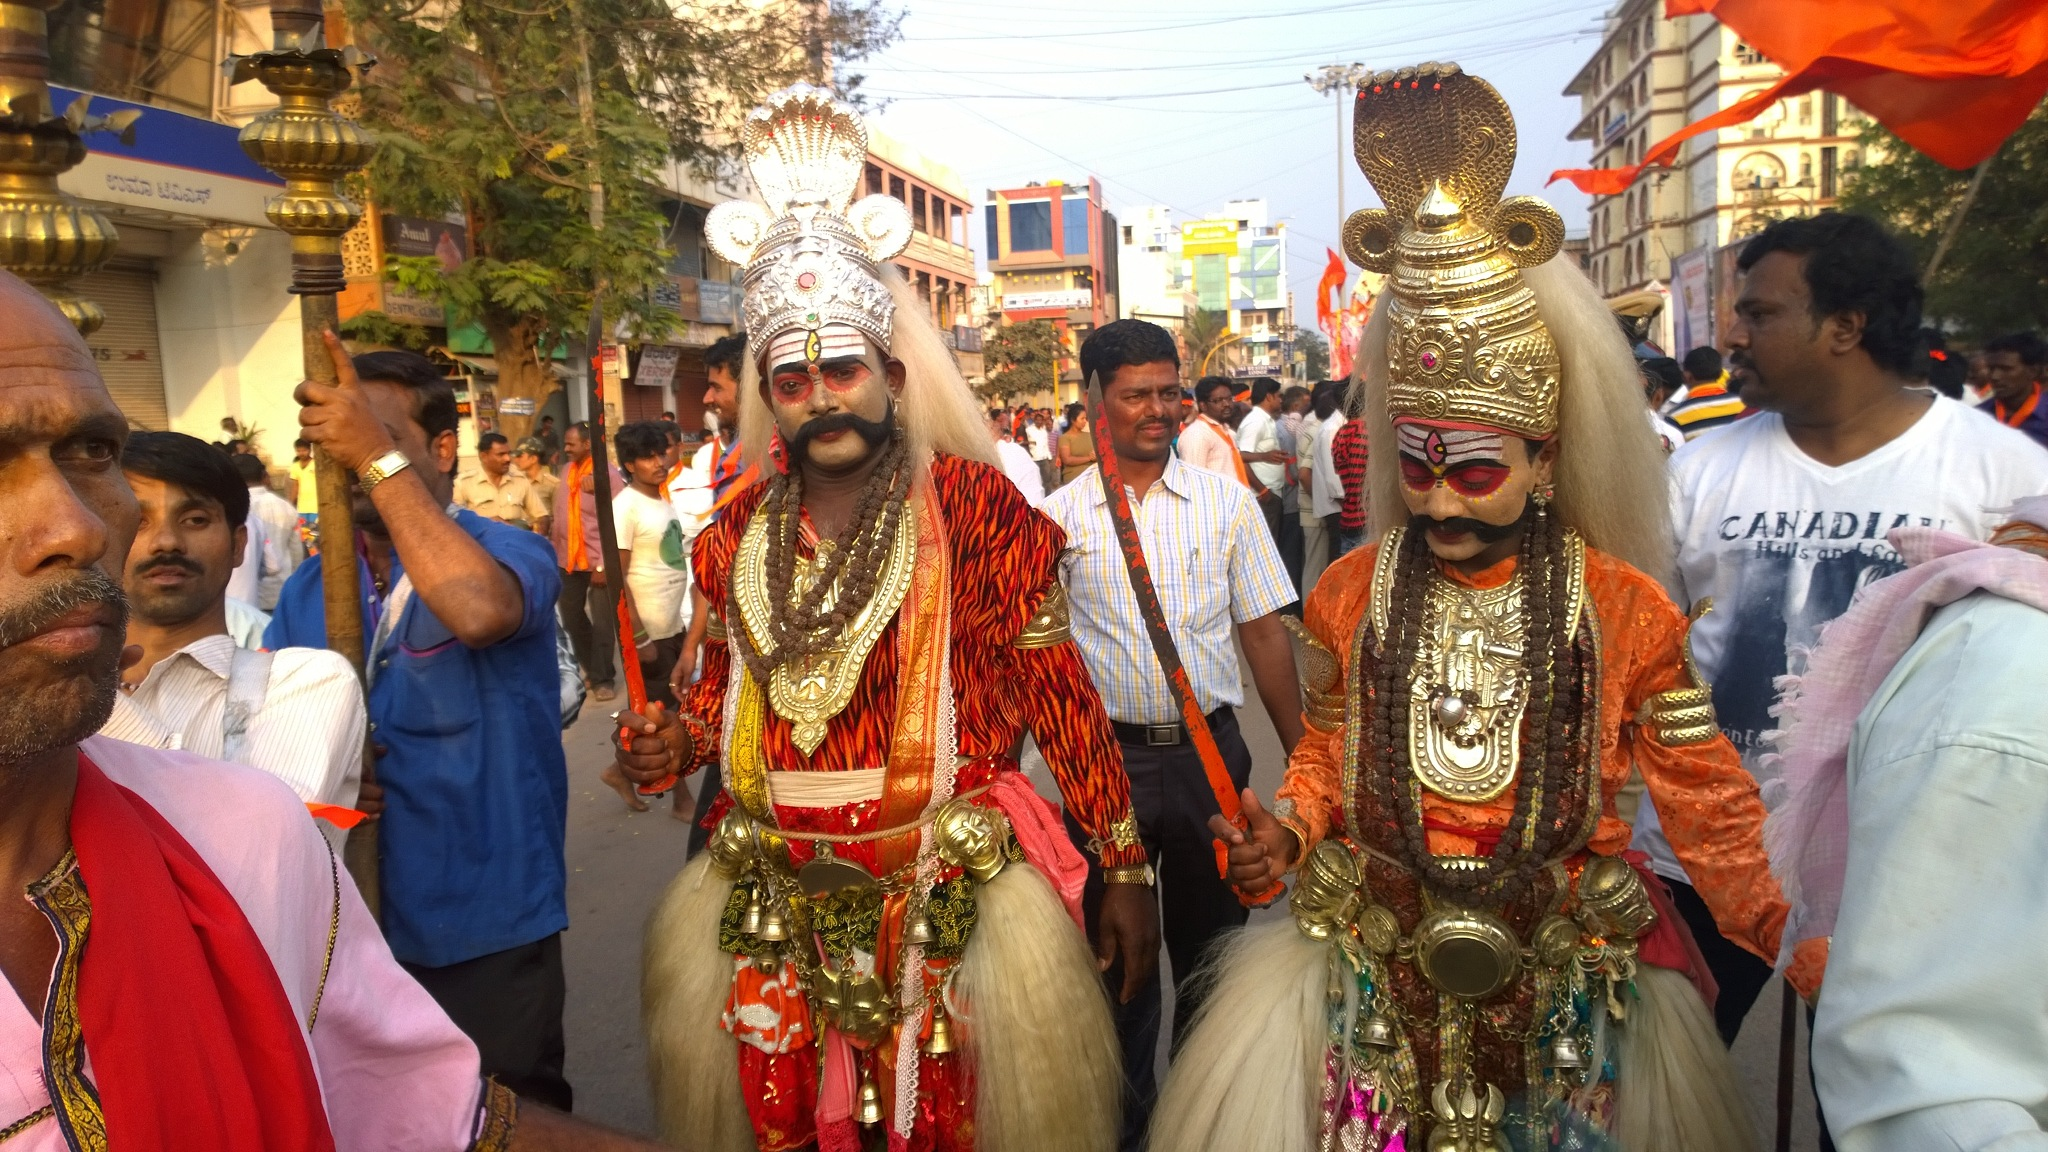 fancy dress for the cultural procession it's in Hospet karnataka india by Manjappa Rangappanavar